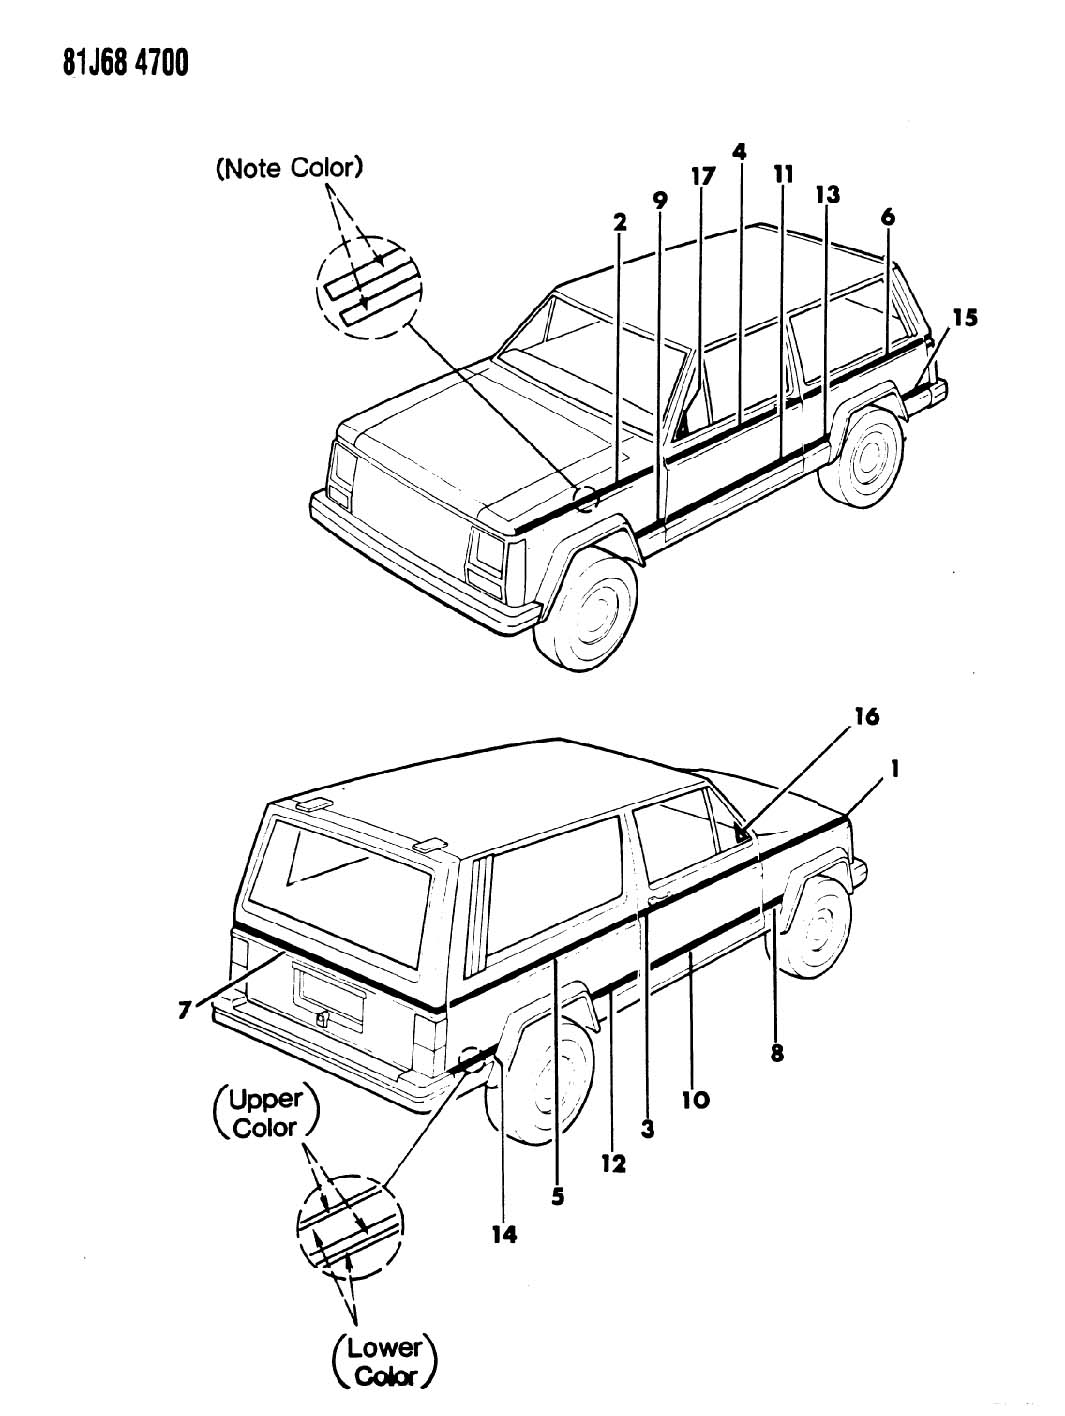 1986 Jeep Cherokee DECALS, EXTERIOR 2 TONE, 1986 XJ